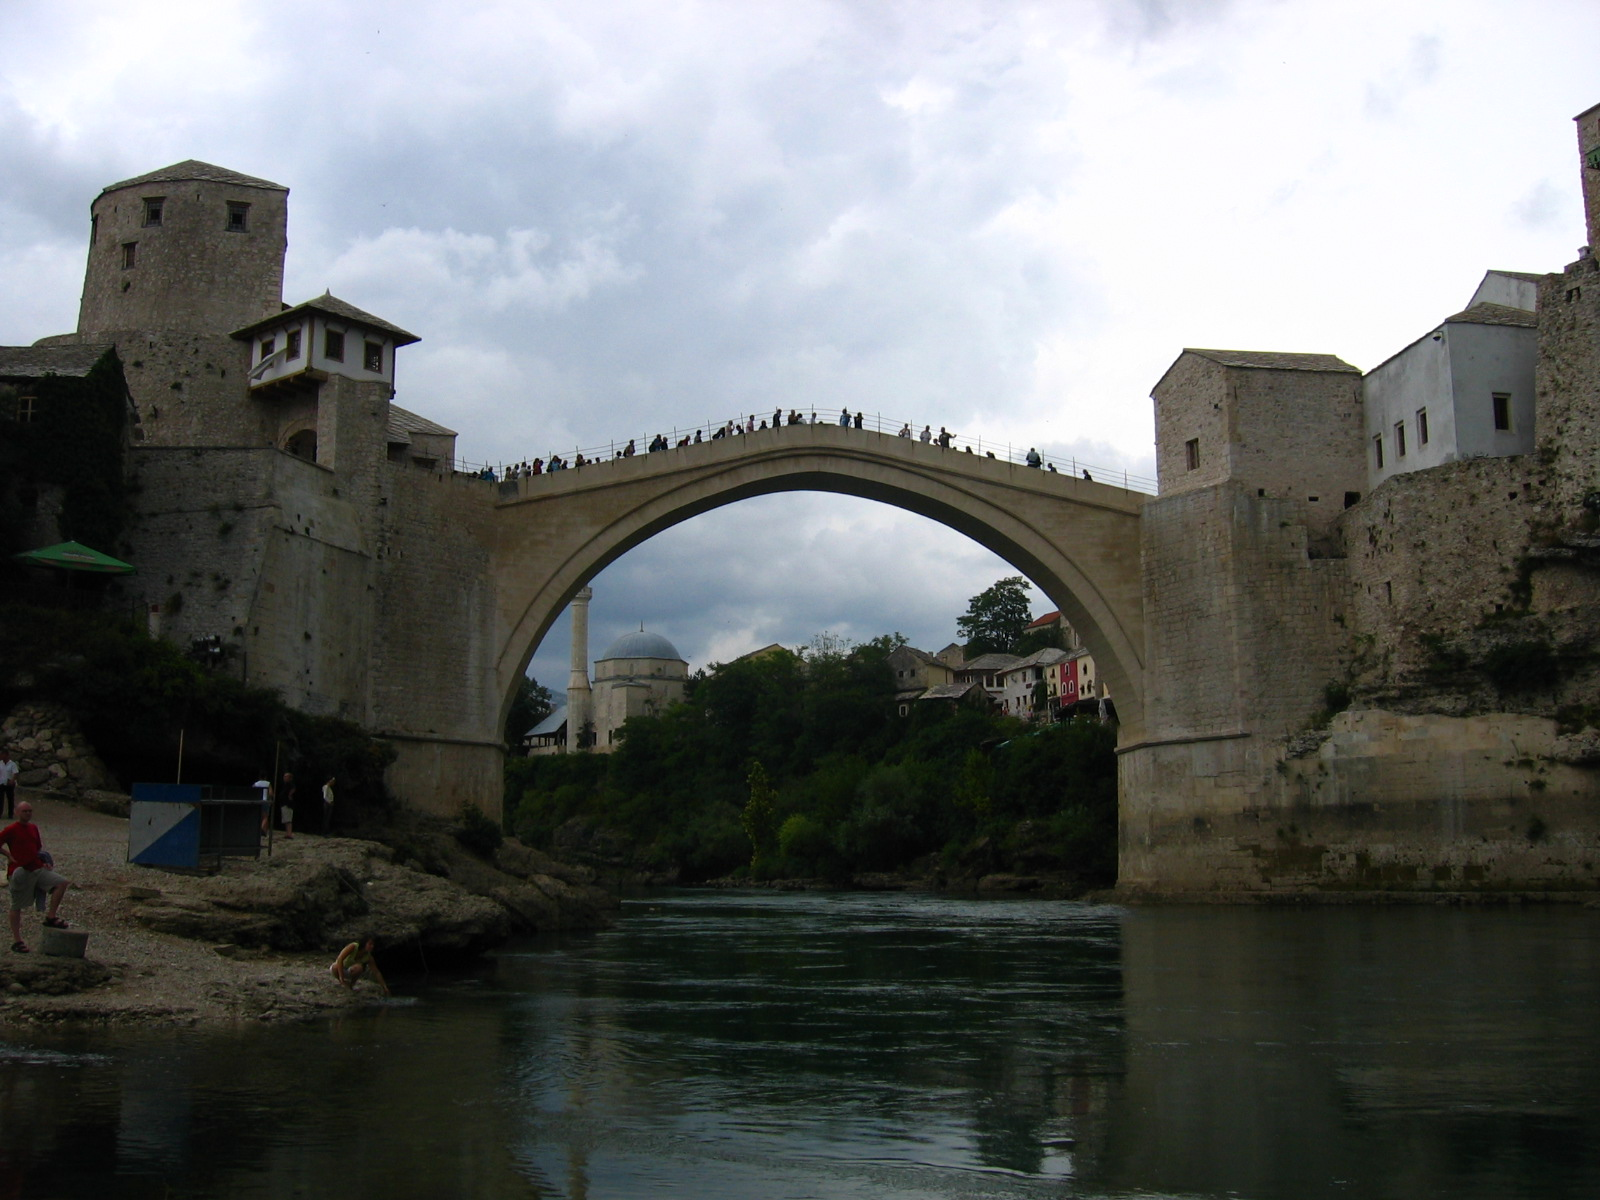 File:Old Bridge, Mostar, Herzegovina.JPG - Wikimedia Commons